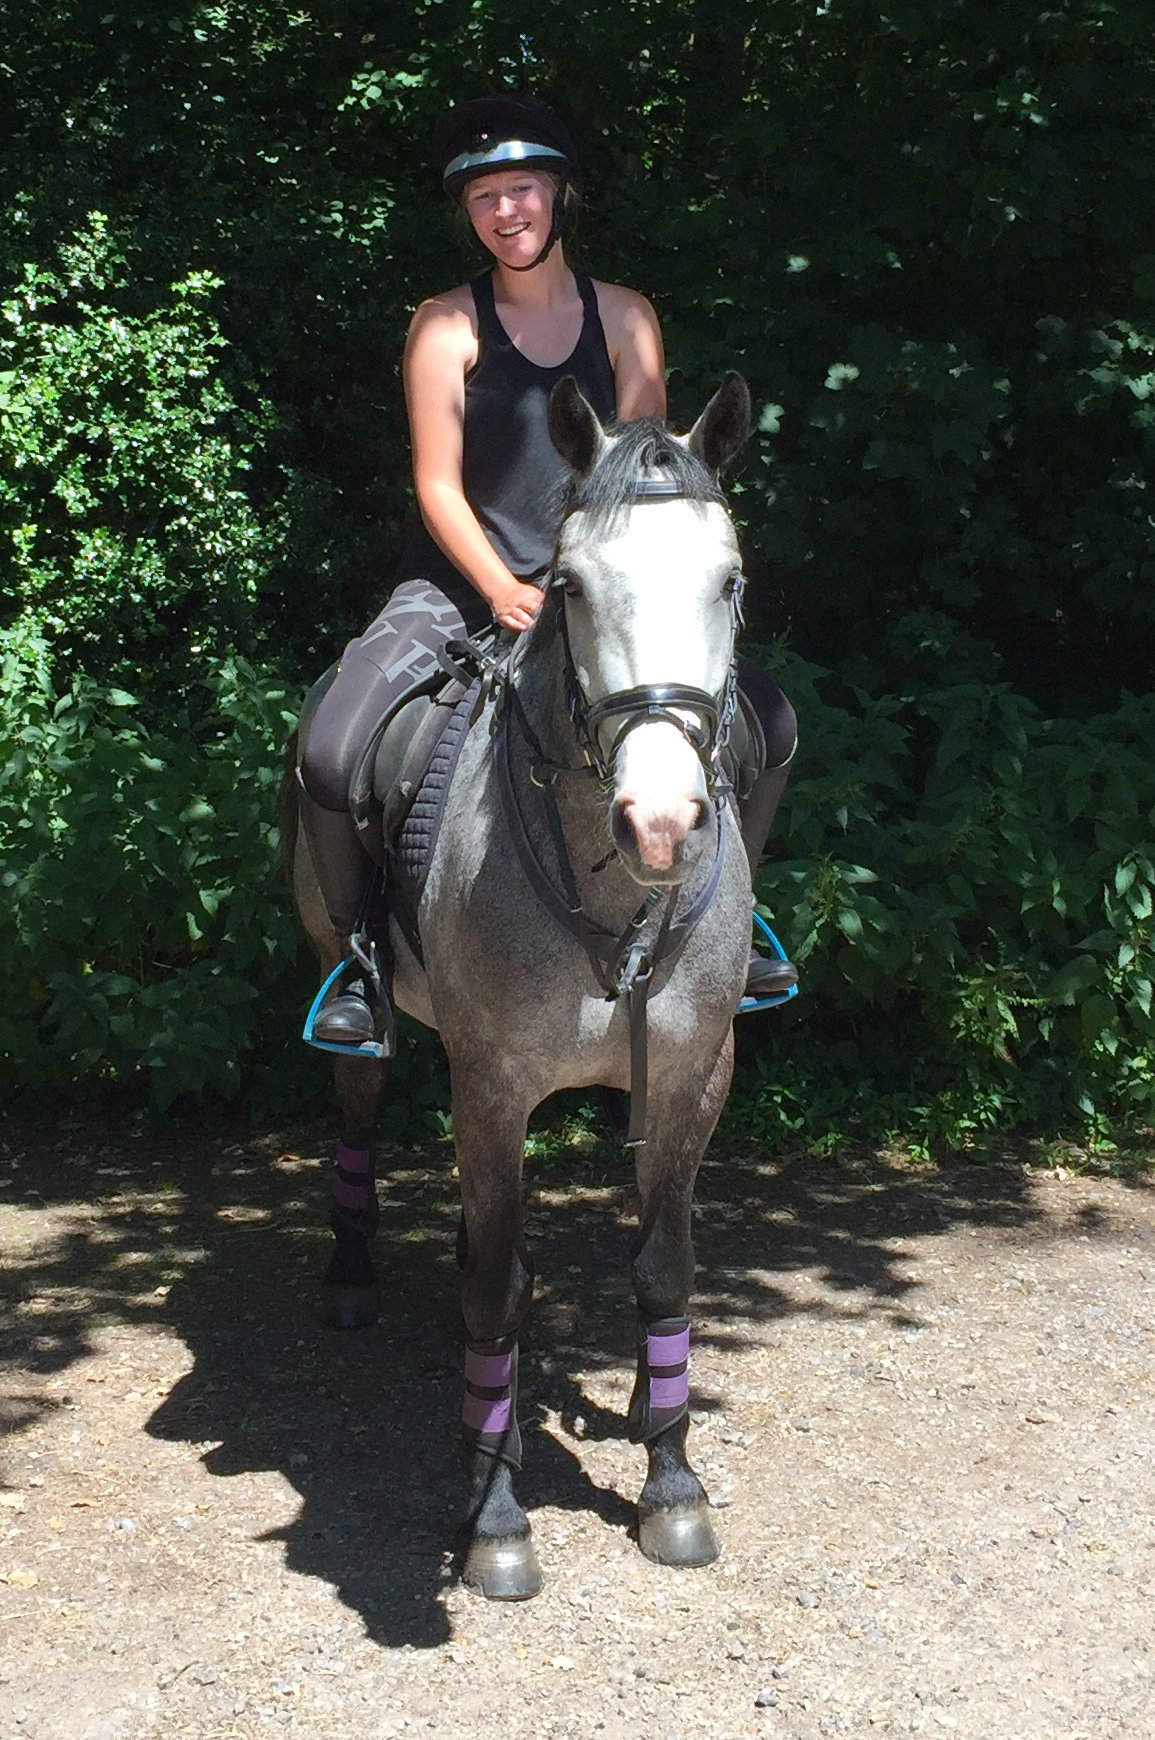 Riding after cruciate surgery